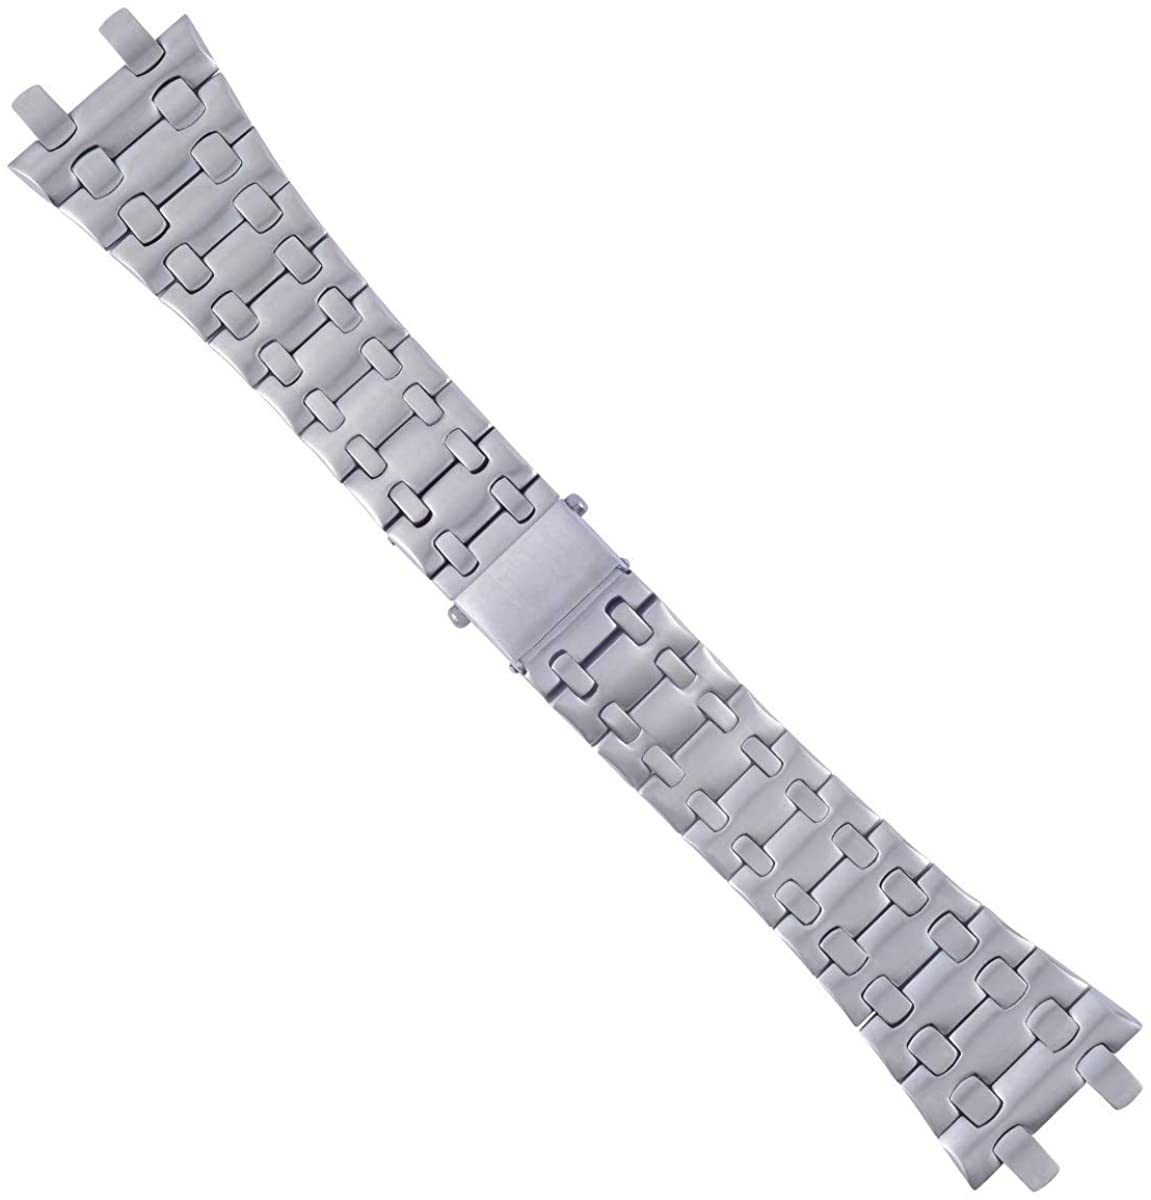 Watch Band 5 ☆ popular Bracelet Compatible with Las Vegas Mall Royal Audemars Oak Piguet Of